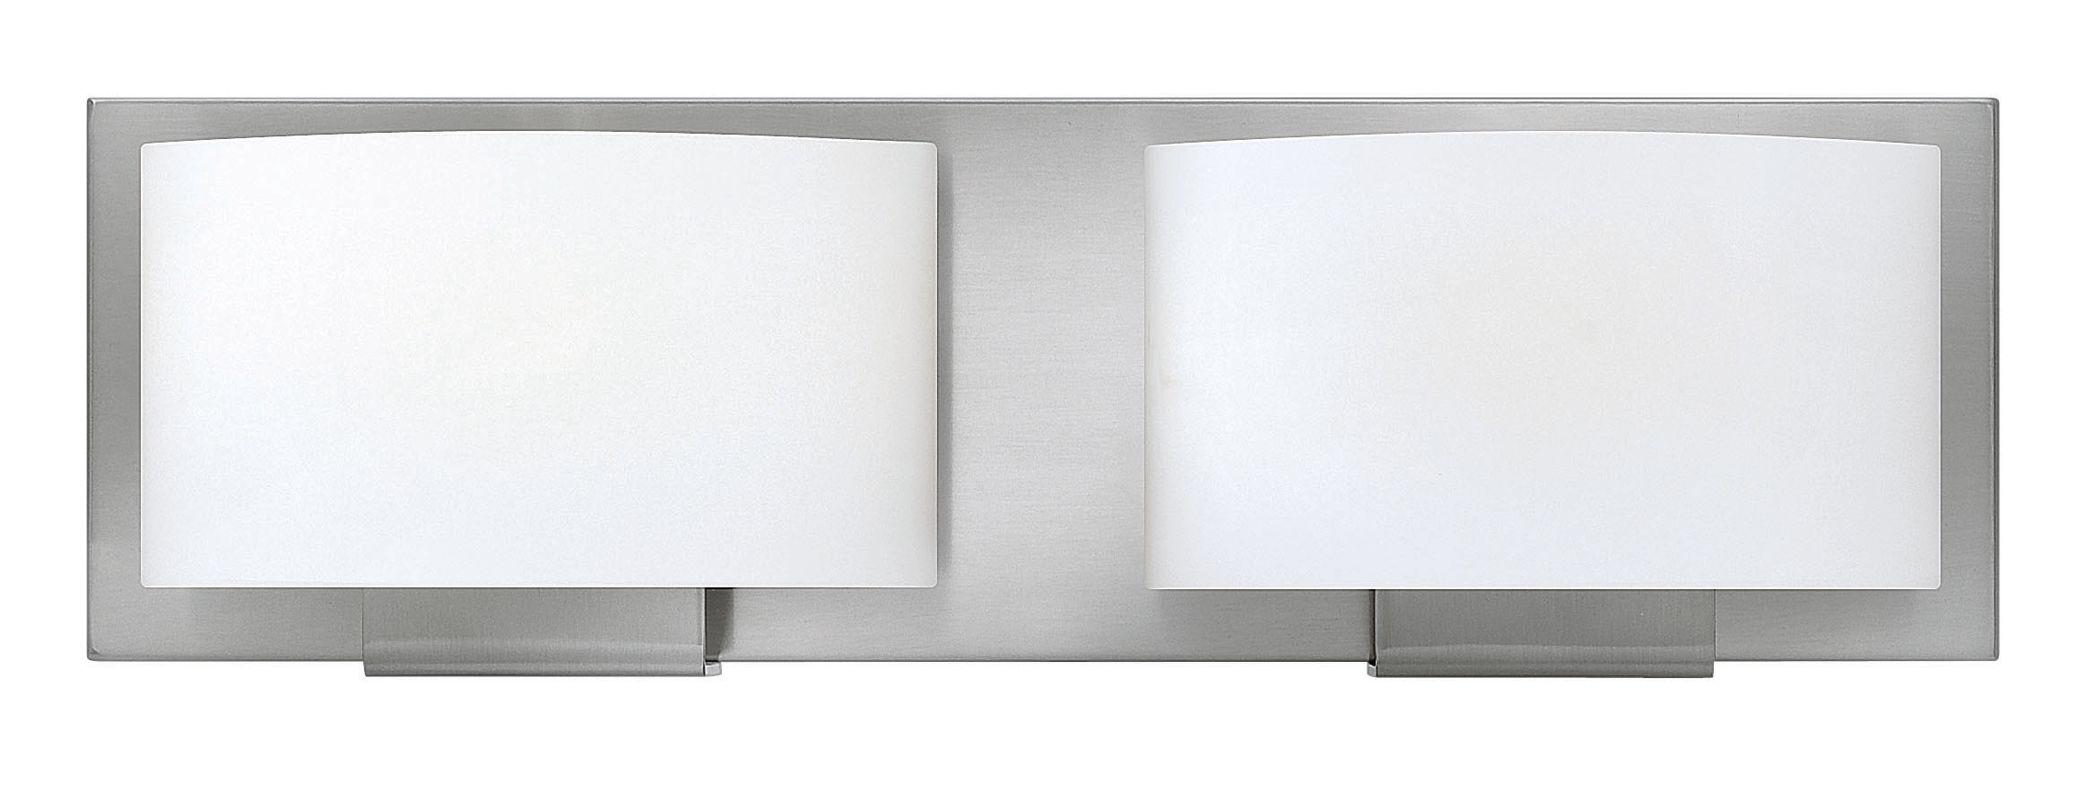 Hinkley Lighting 53552 2 Light ADA Compliant Bathroom Vanity Light